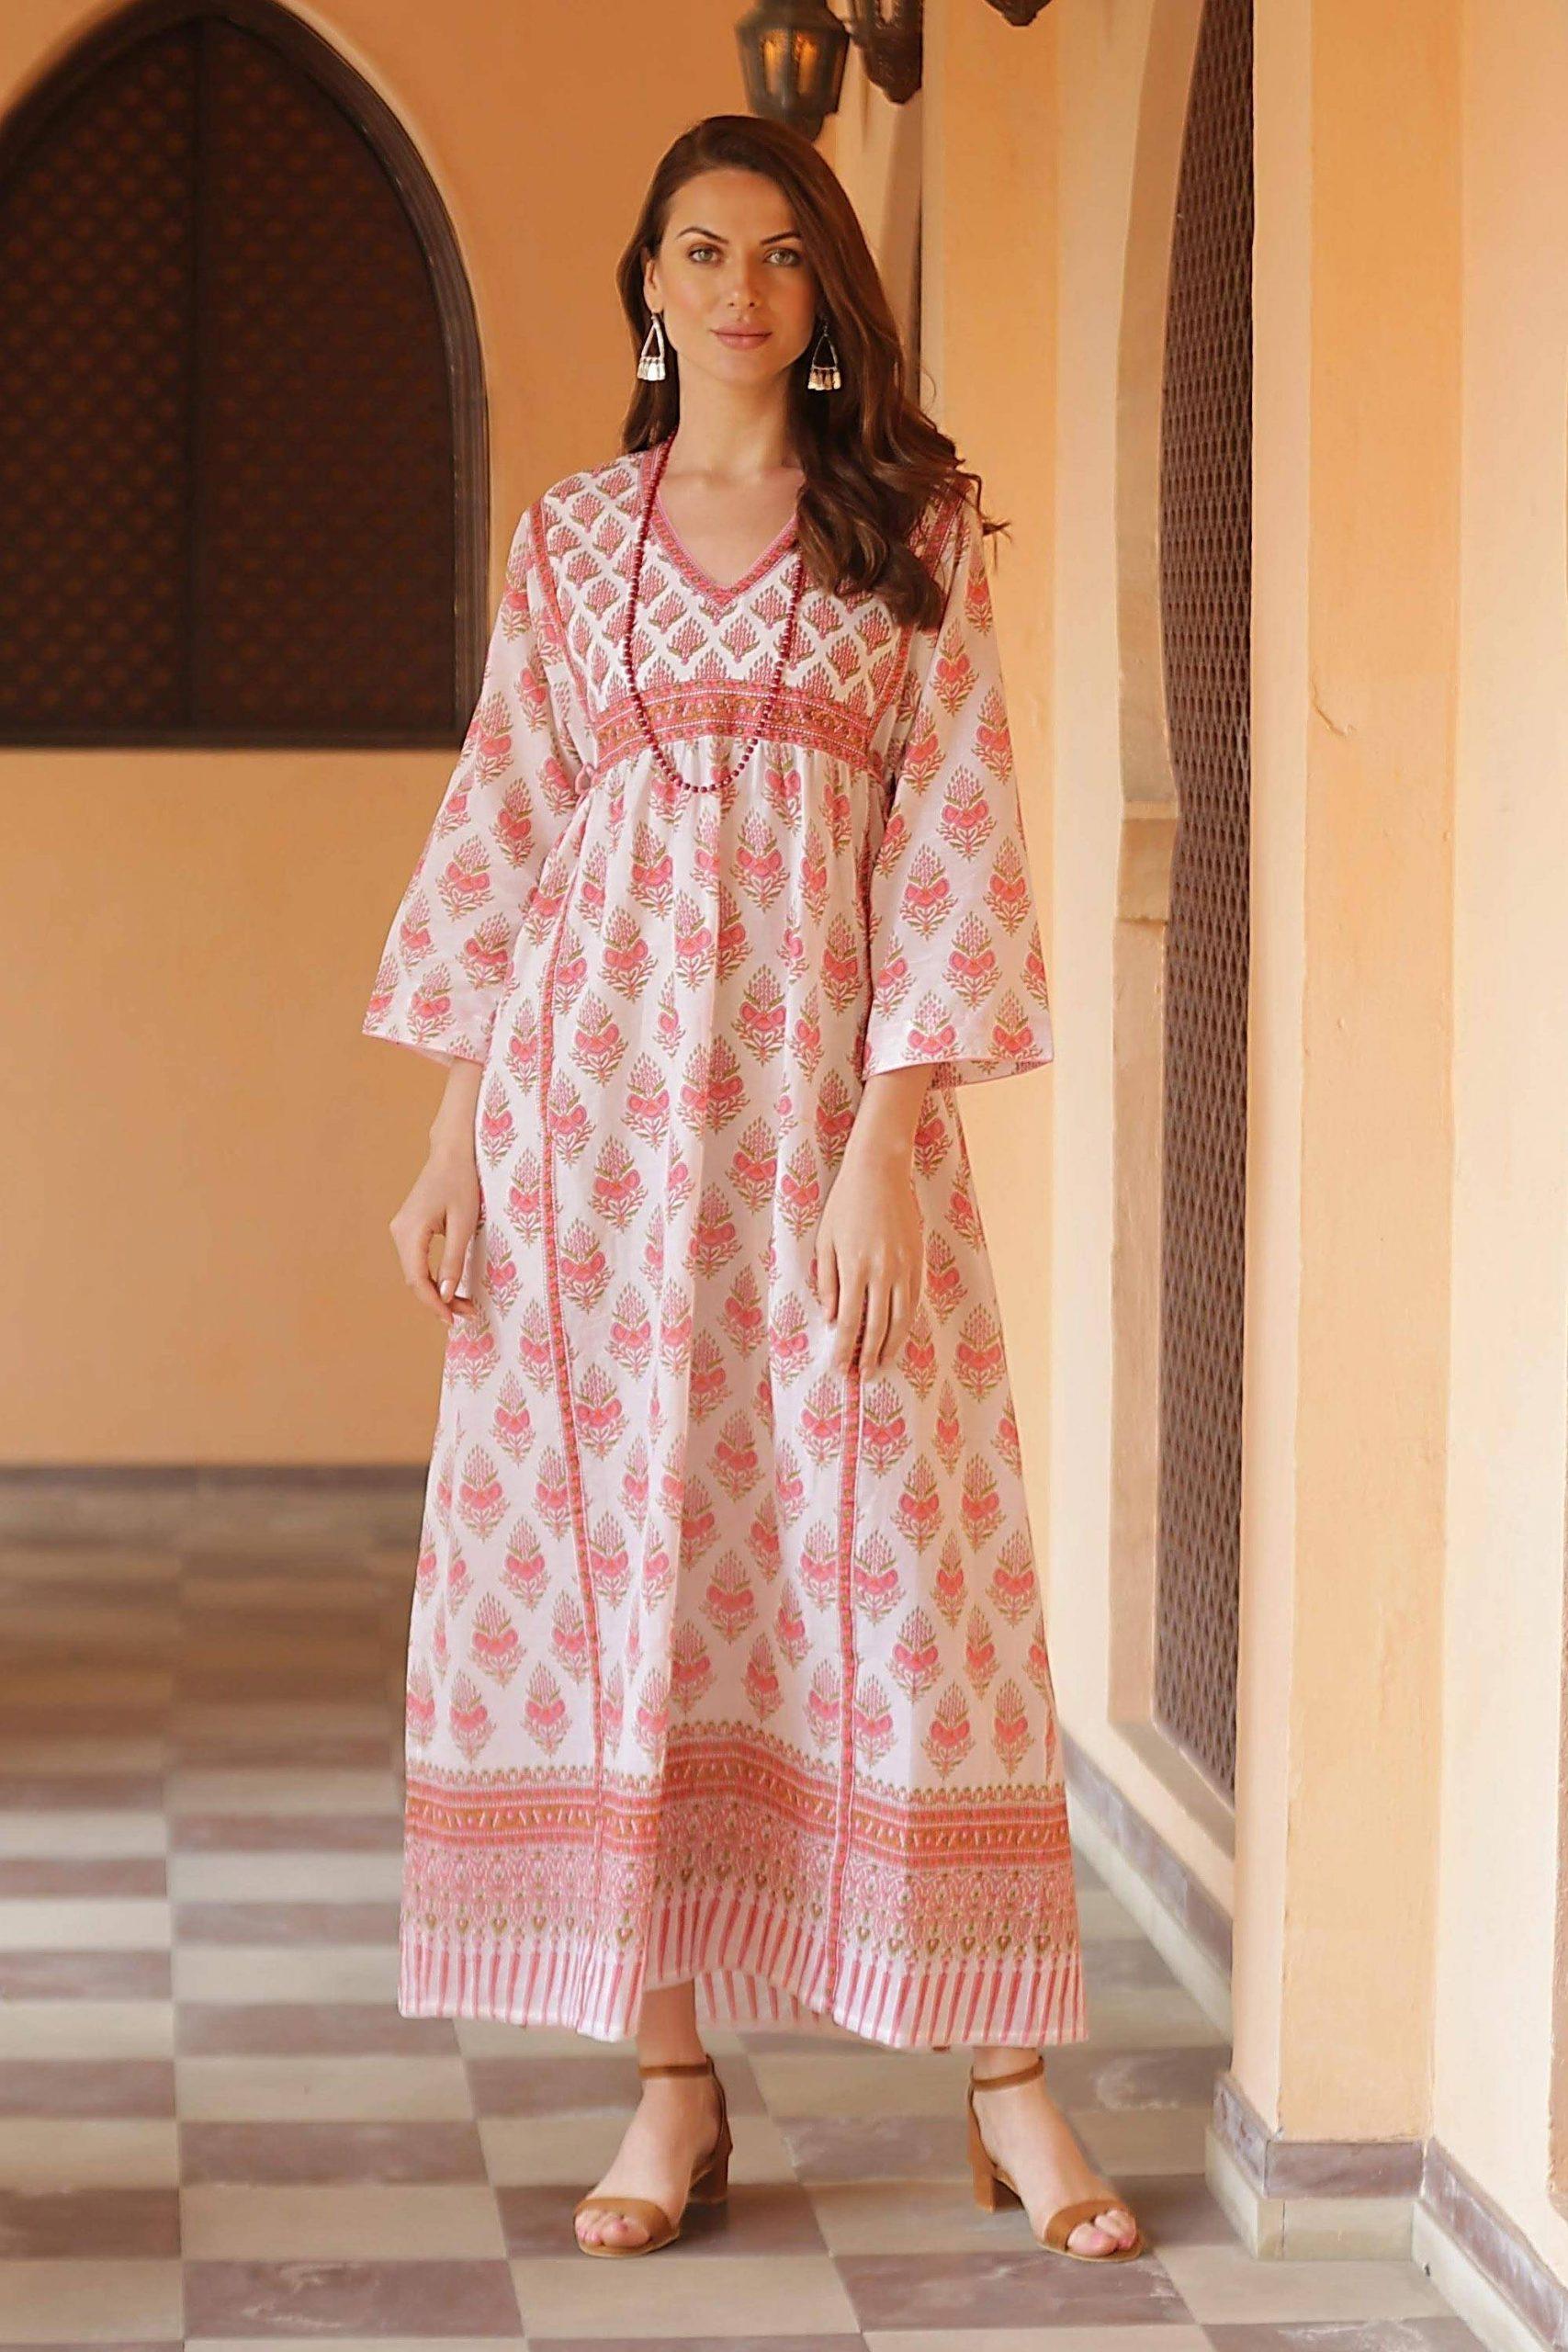 "Pink Floral Print Cotton Maxi Dress, ""Floral Fantasy"" Fall Fashion"